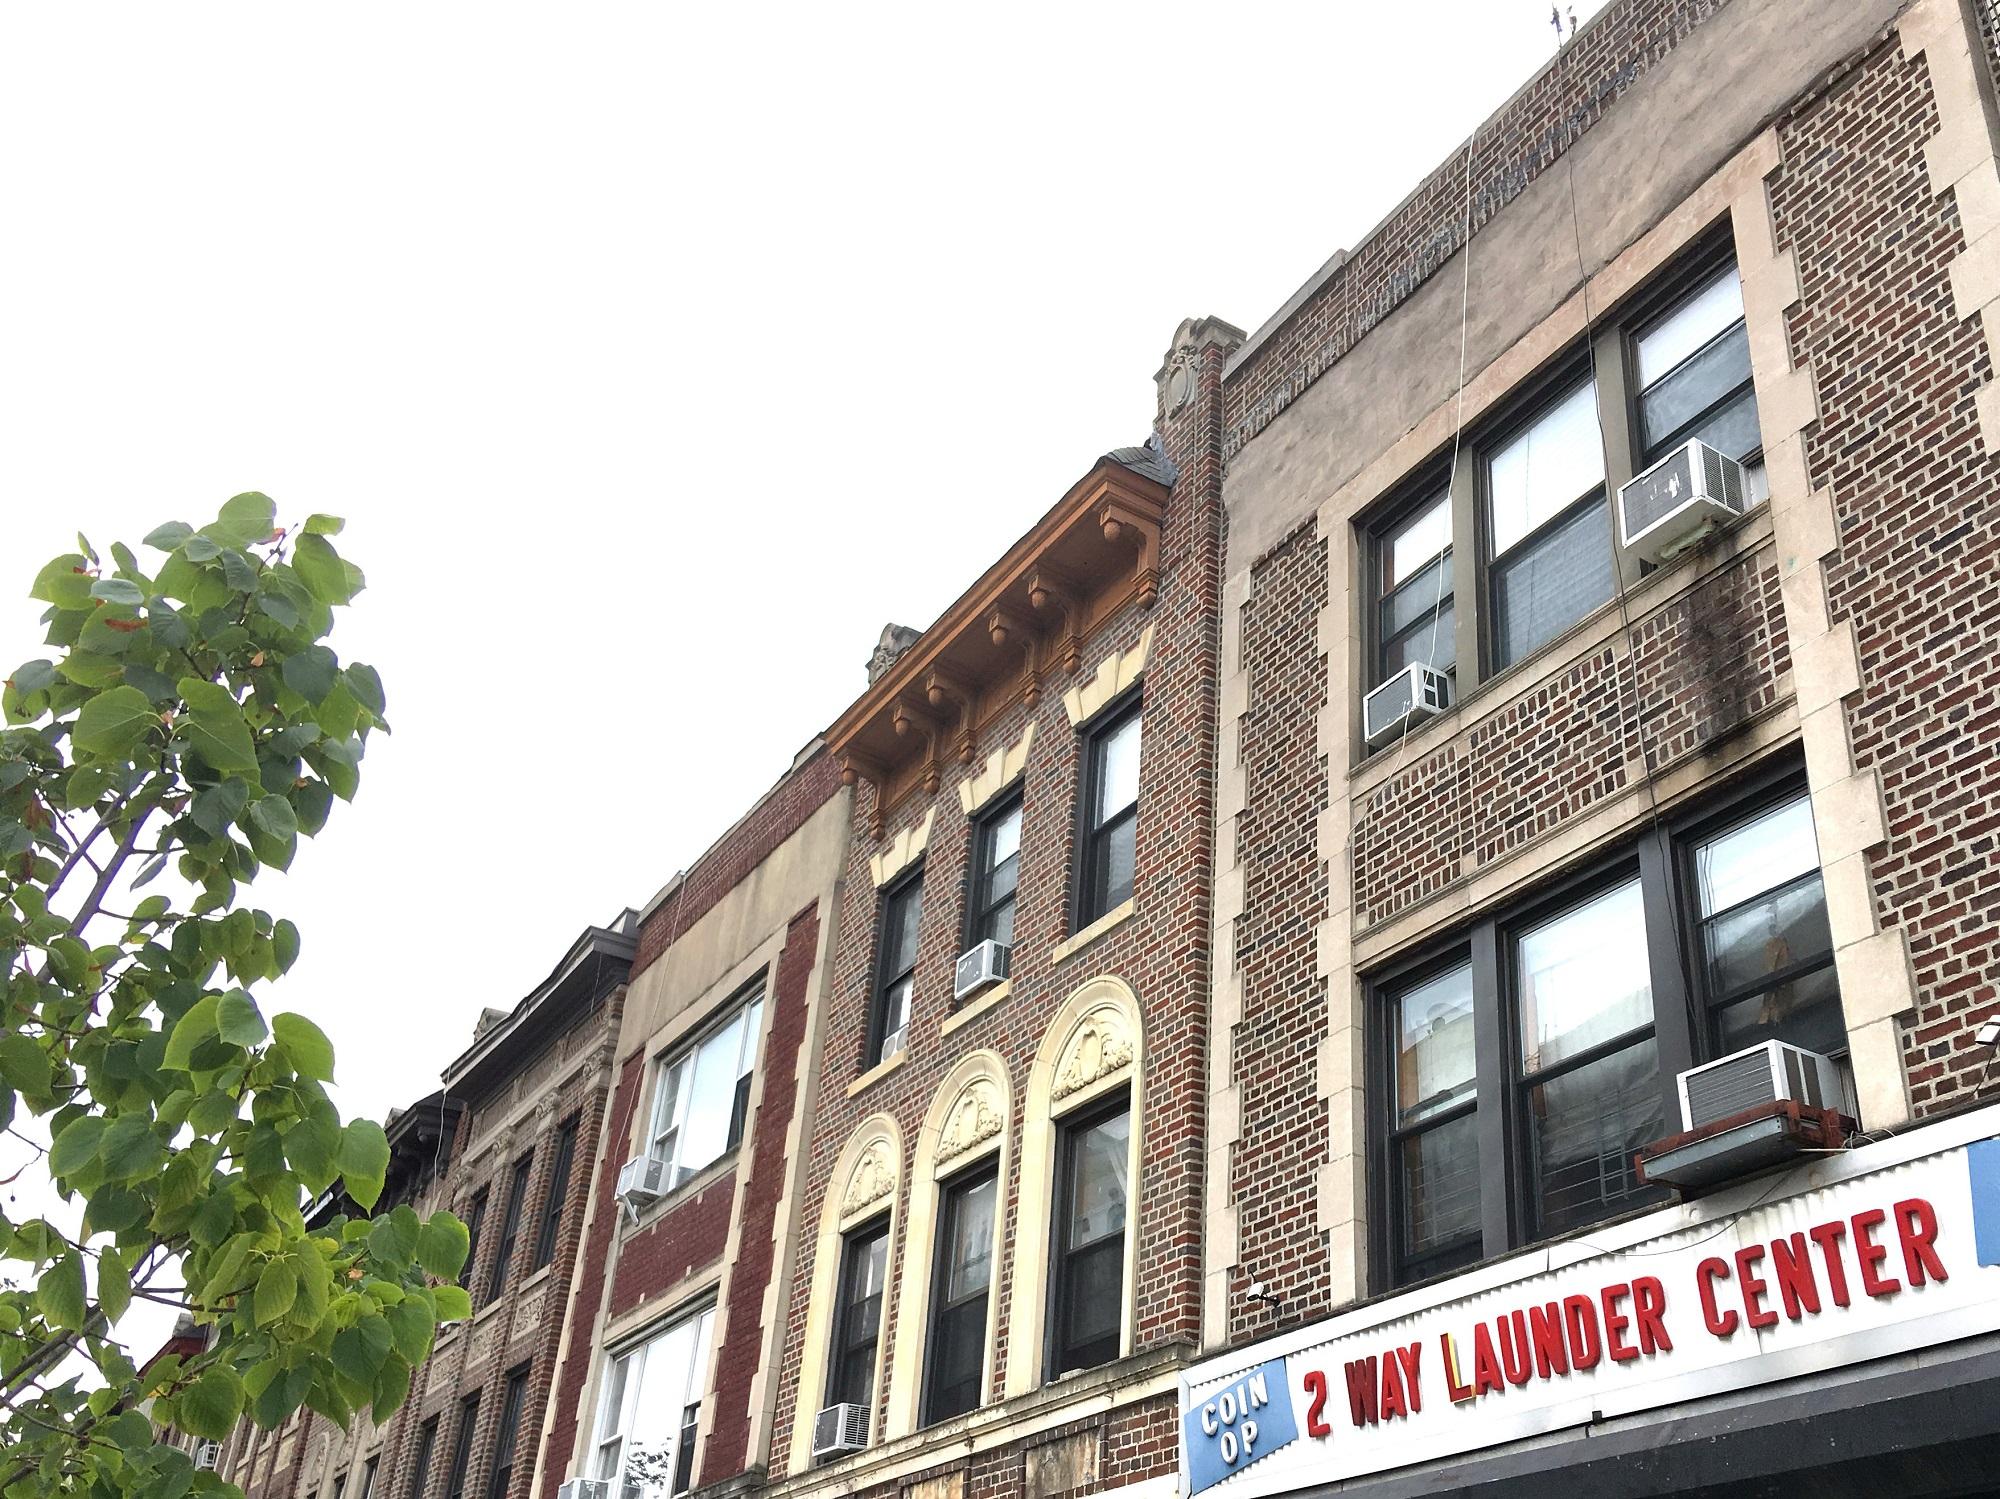 Capital repairs of apartment buildings: pay or not The capital repair rate of an apartment building